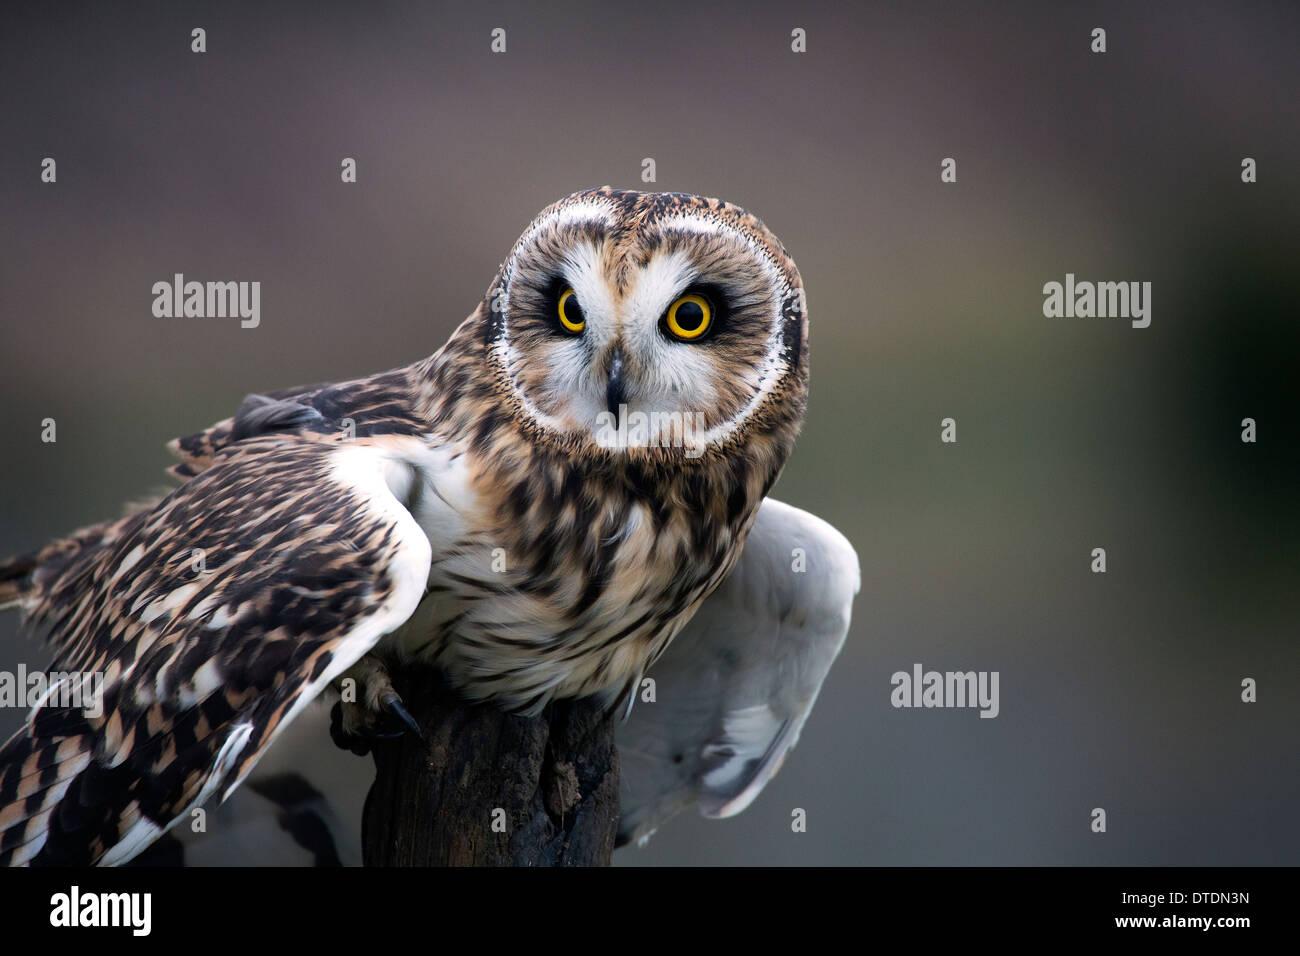 Owl retrato Imagen De Stock